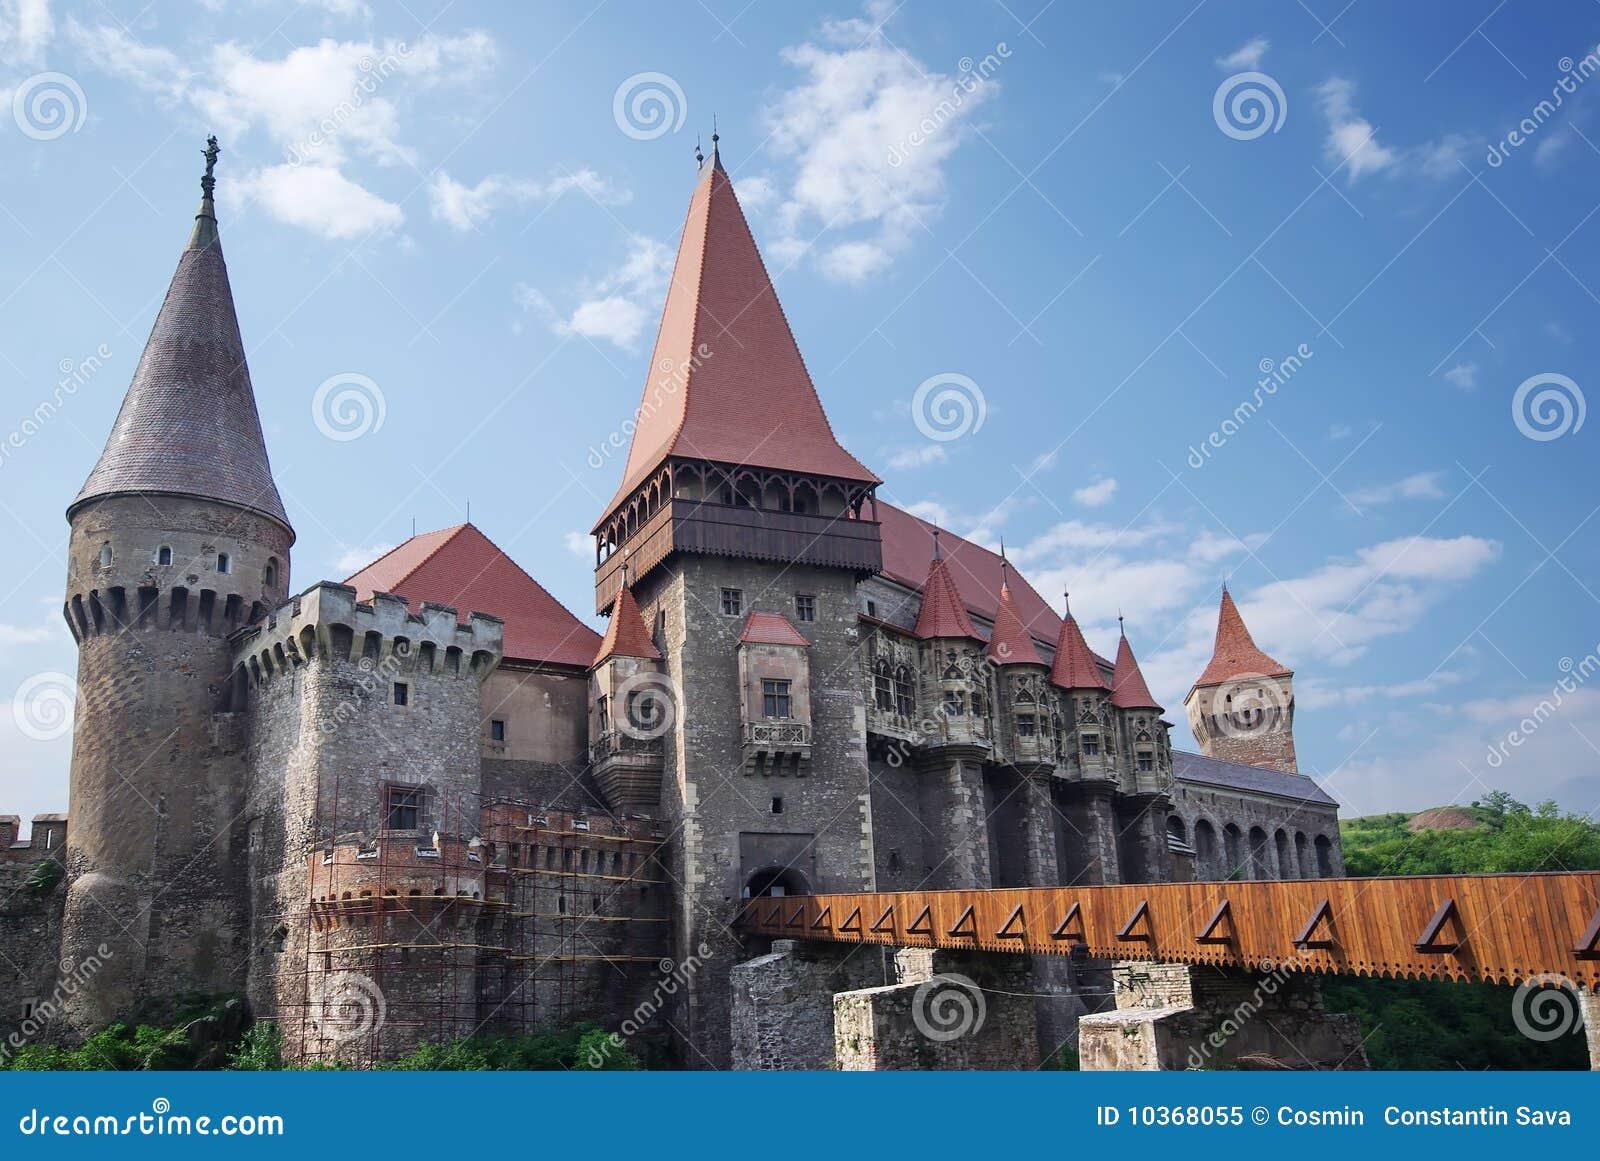 Middeleeuws kasteel in Roemenië